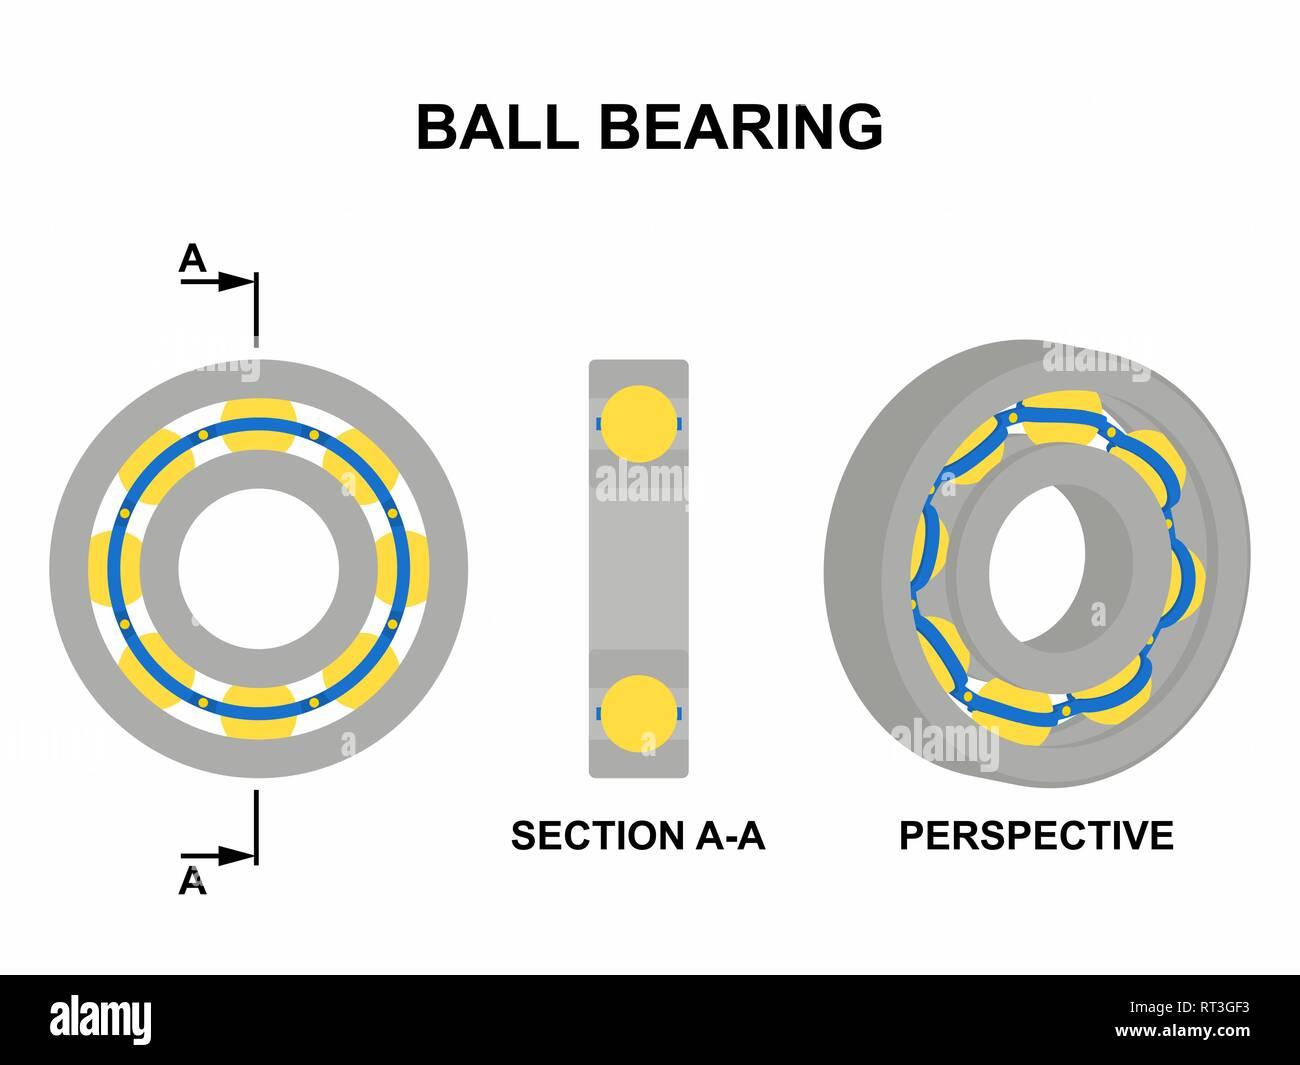 Ball Bearing - Stock Vector